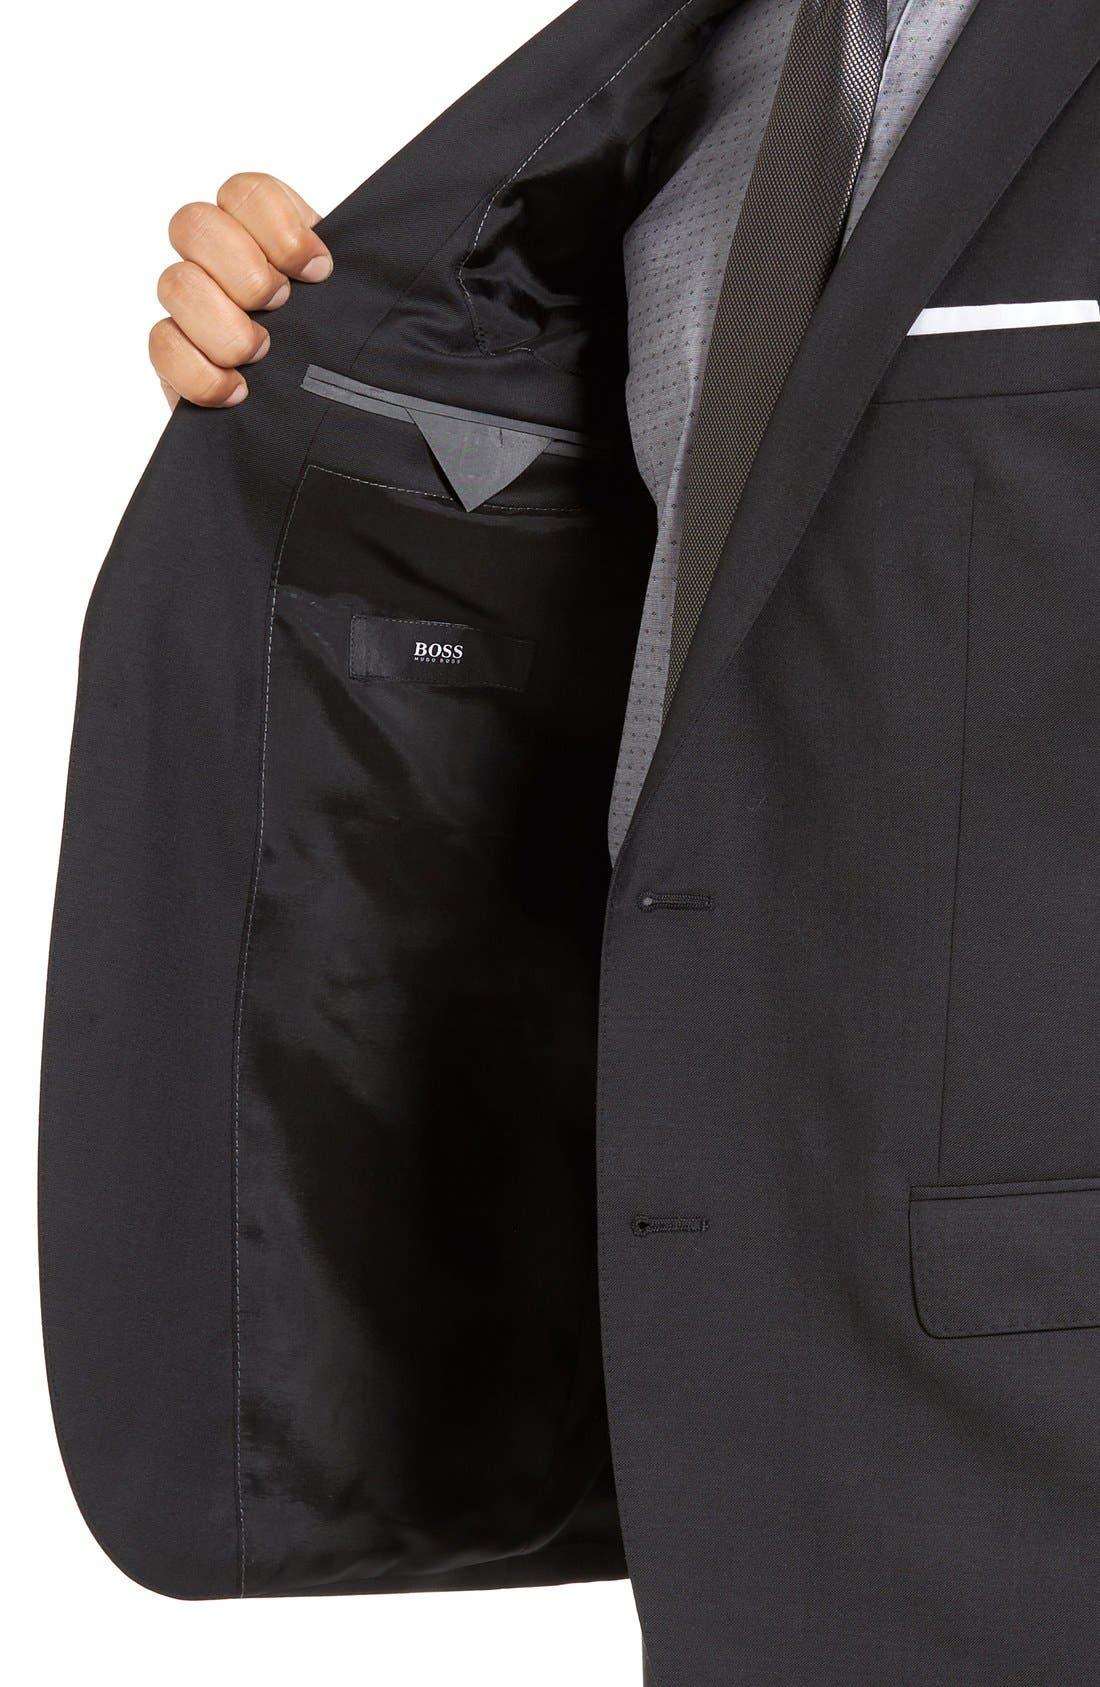 Huge/Genius Trim Fit Wool Suit,                             Alternate thumbnail 7, color,                             021